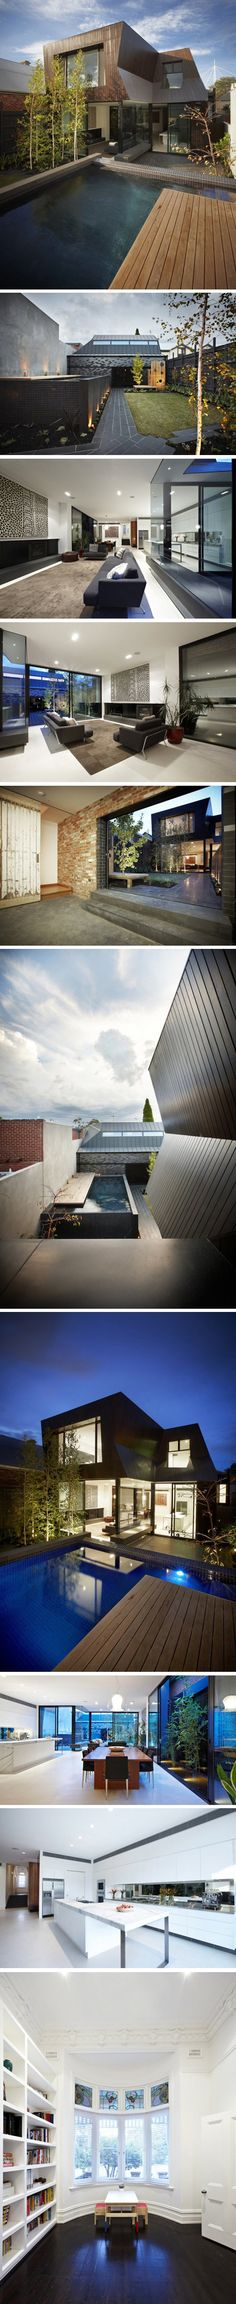 The-Enclave-House-BKK-Architects-2